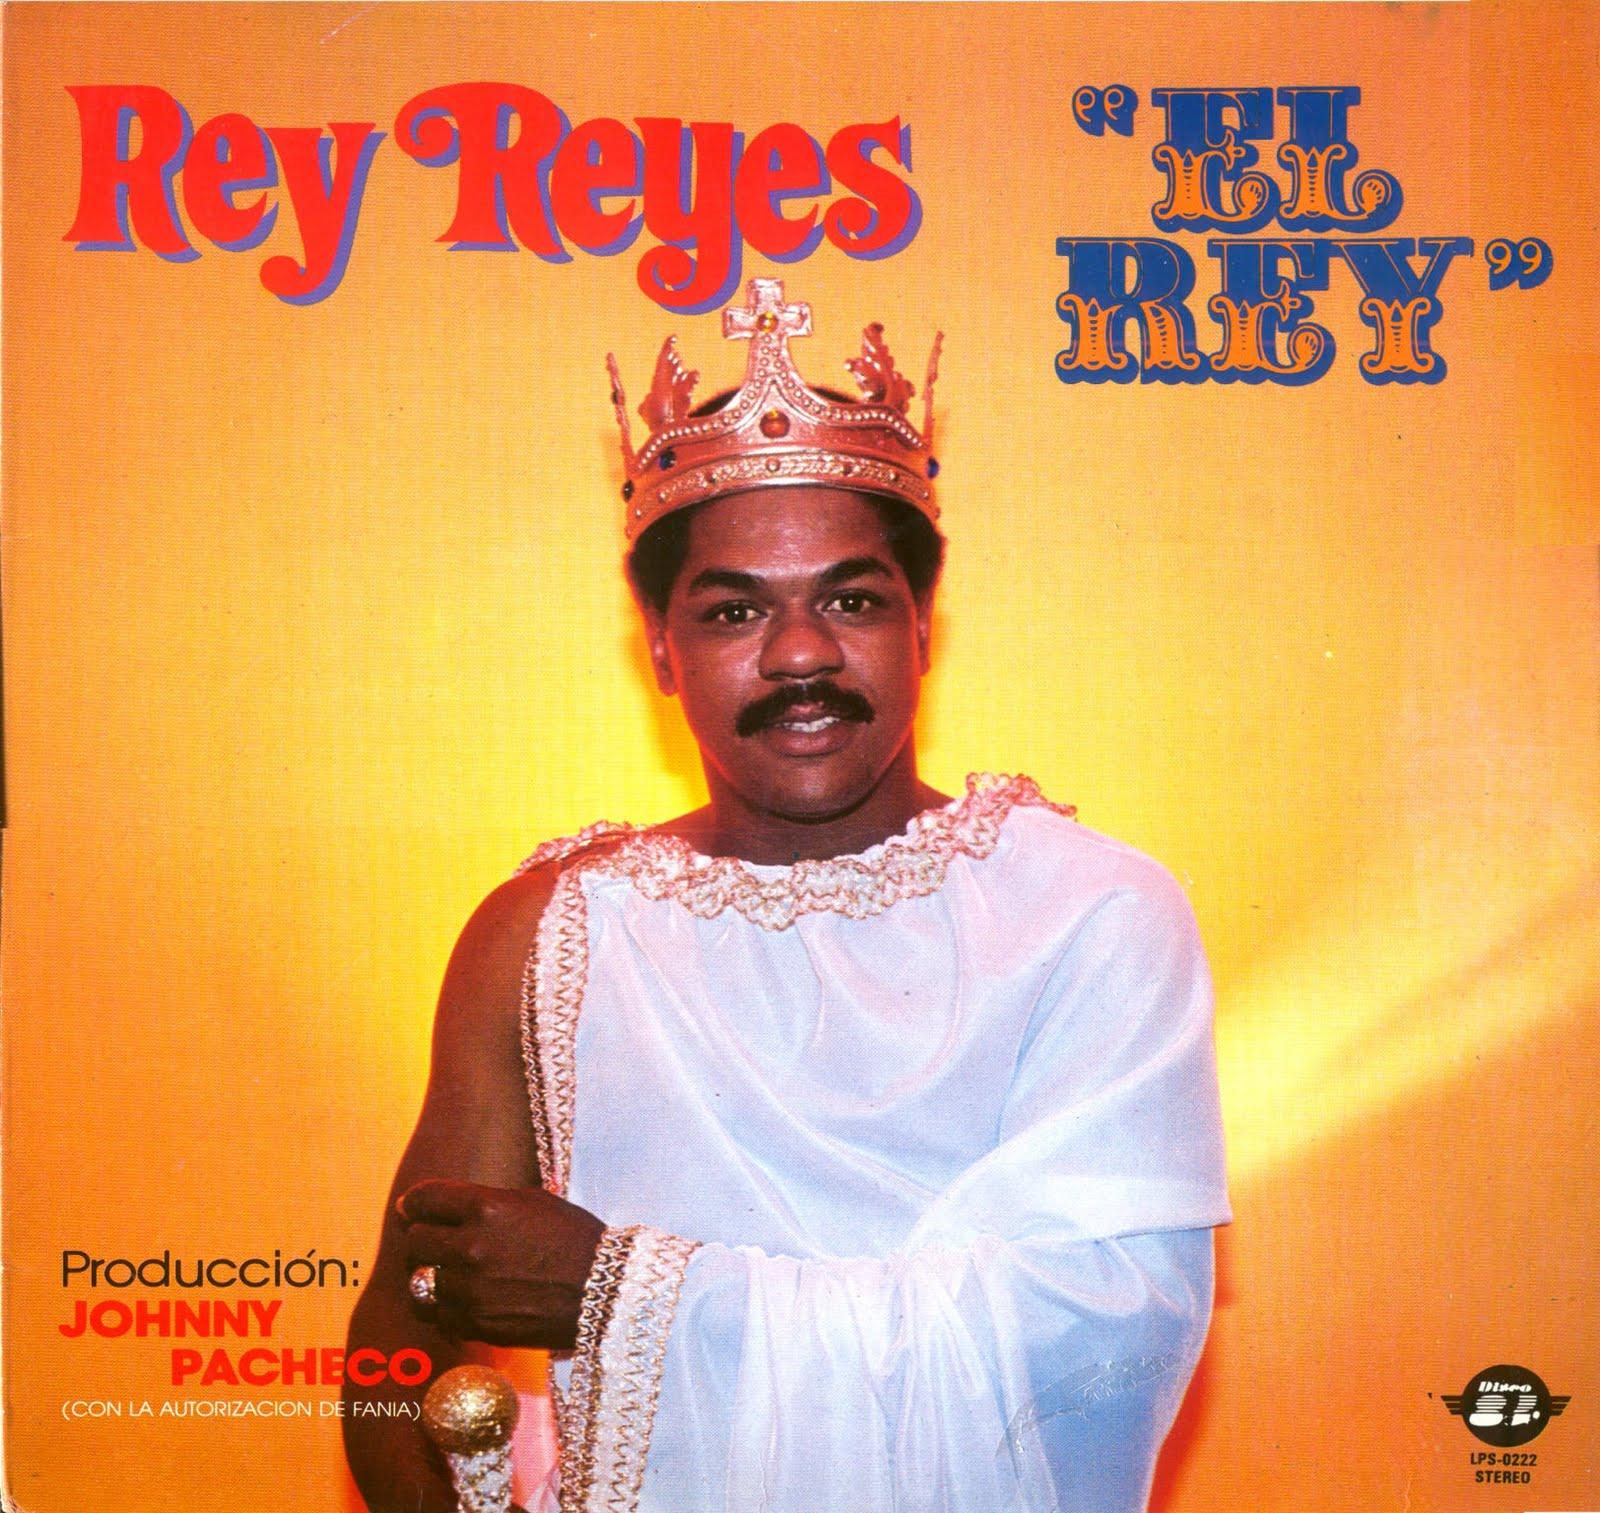 Rey Reyes Nude Photos 13